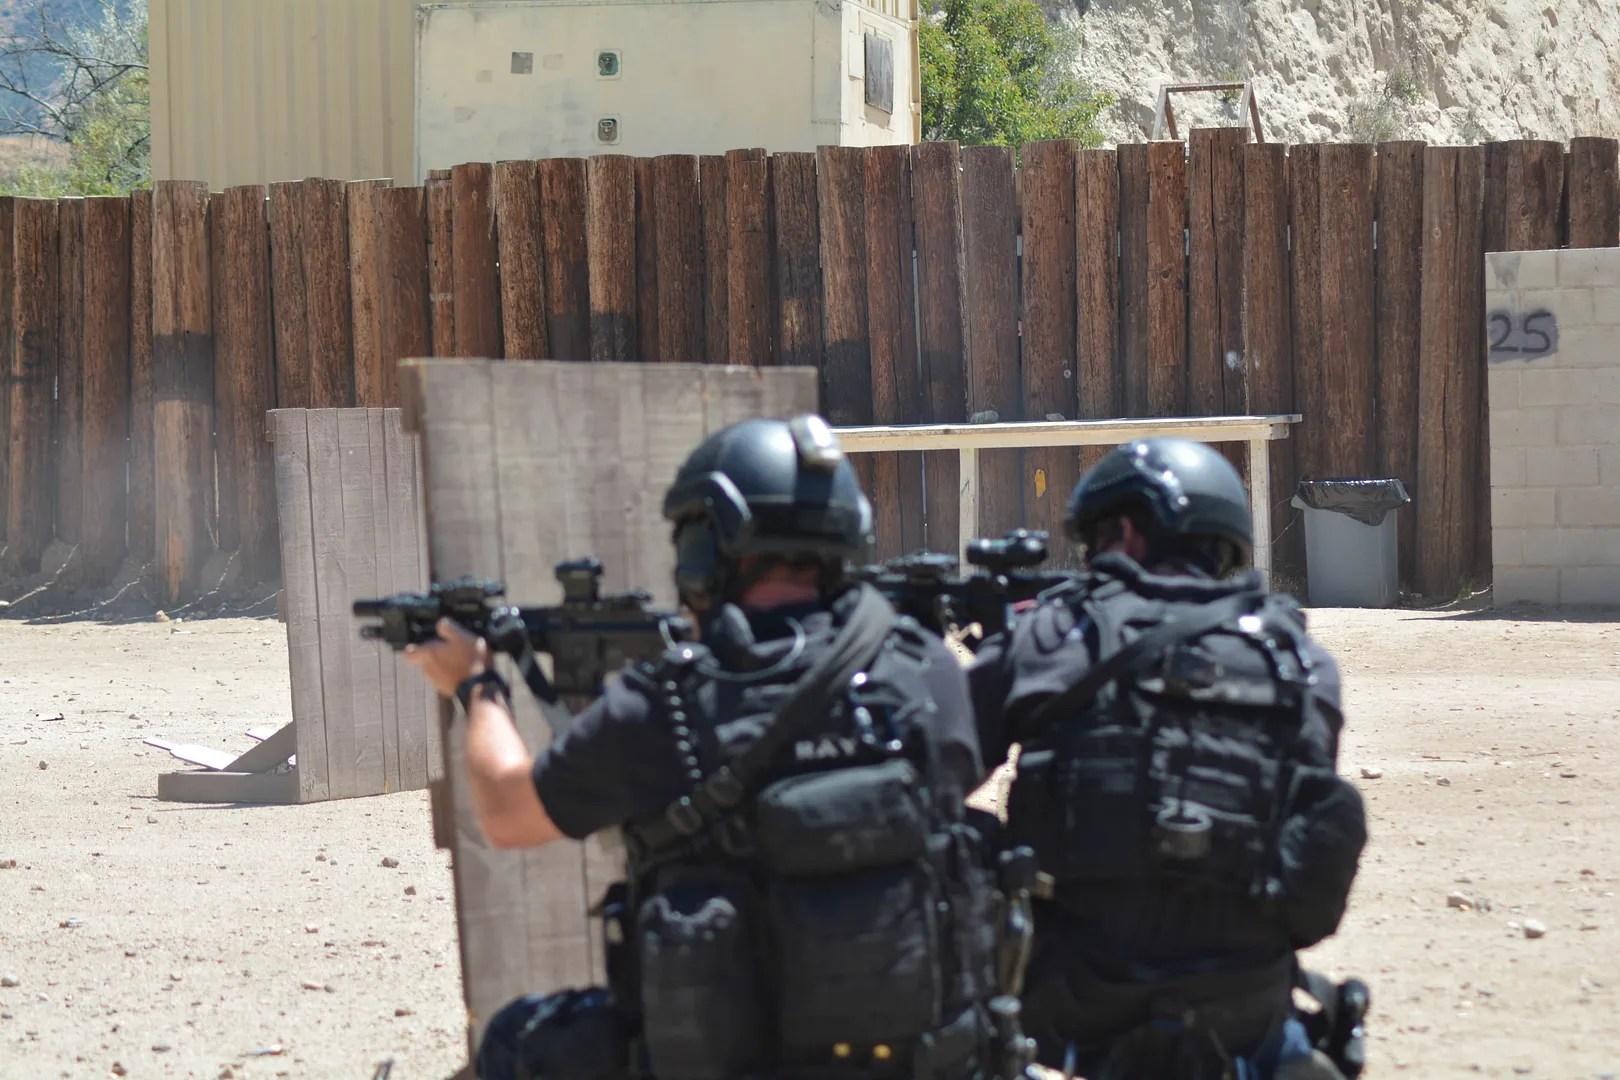 photo LAPD_SWAT_Exercise_16_zpsf3cpcidb.jpg